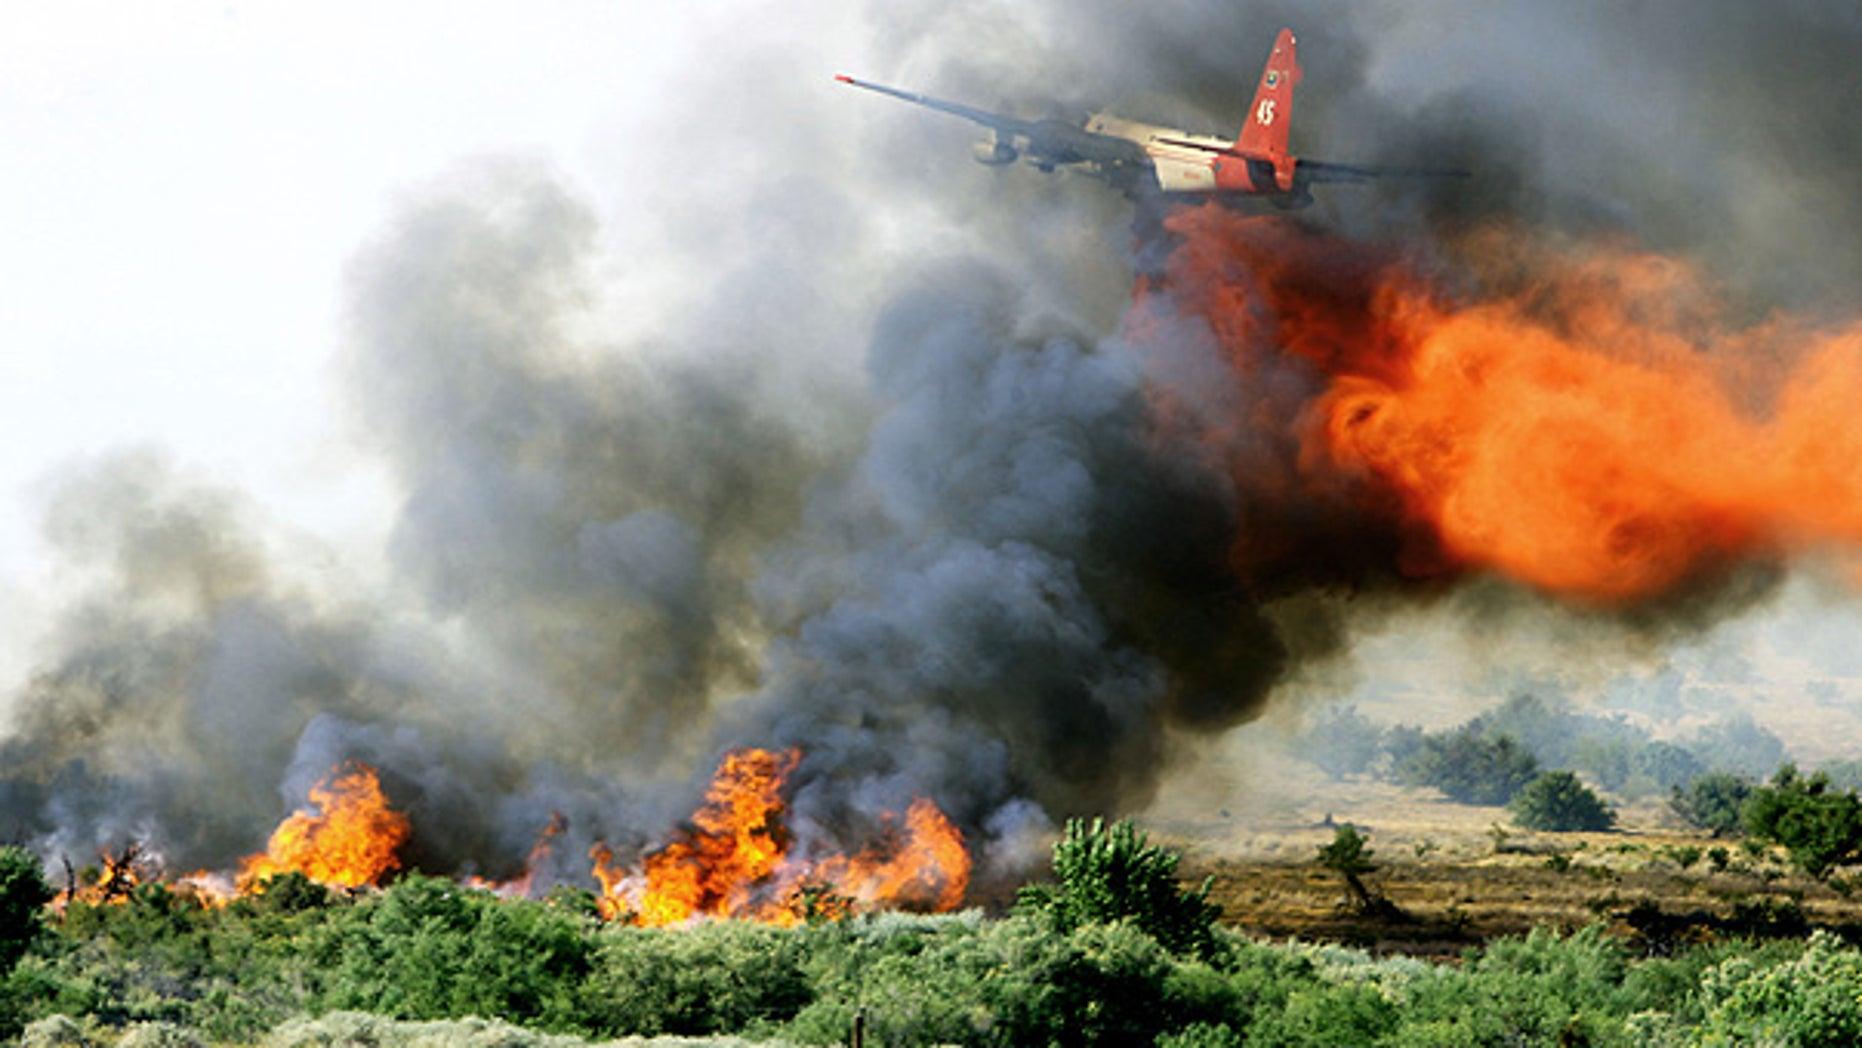 July 1: A tanker drops fire retardant over a fire near Moapa National Wildlife Refuge, 55 miles northeast of Las Vegas.